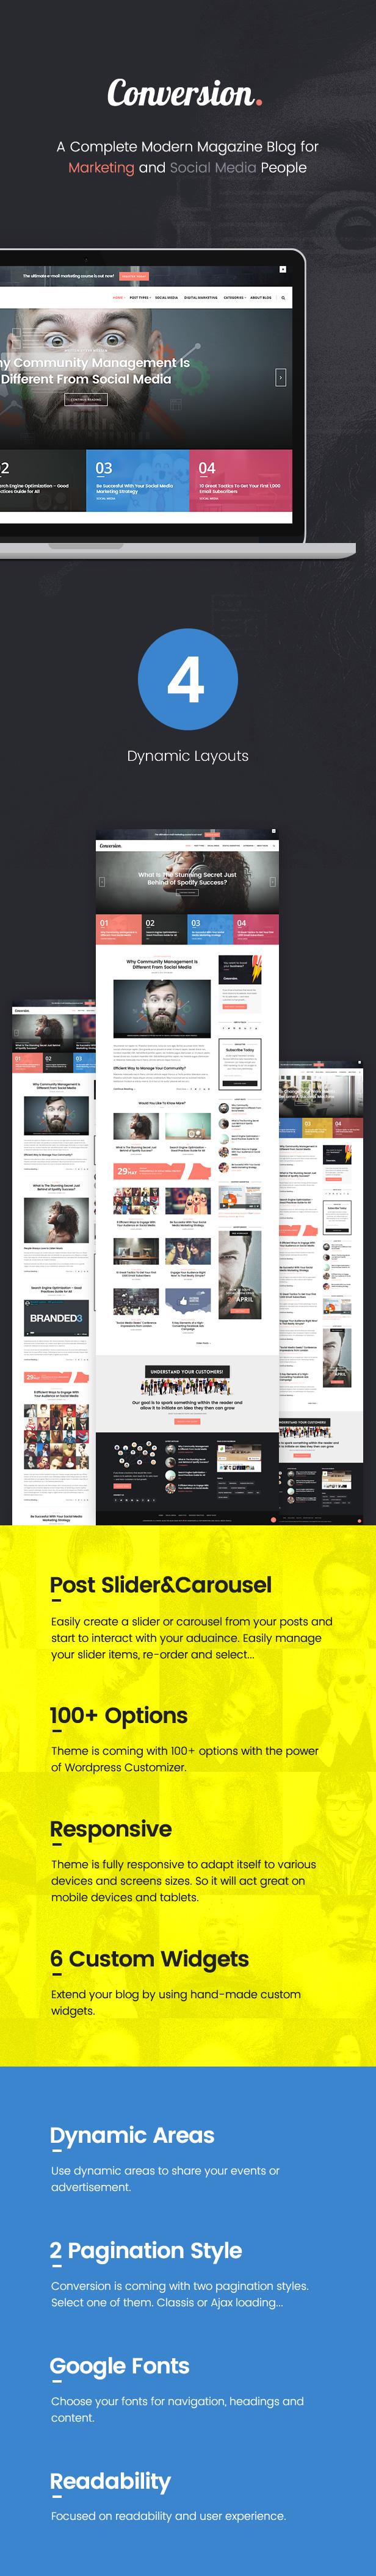 Ultimate Conversion - Digital Marketing Magazine Blog Theme - 1